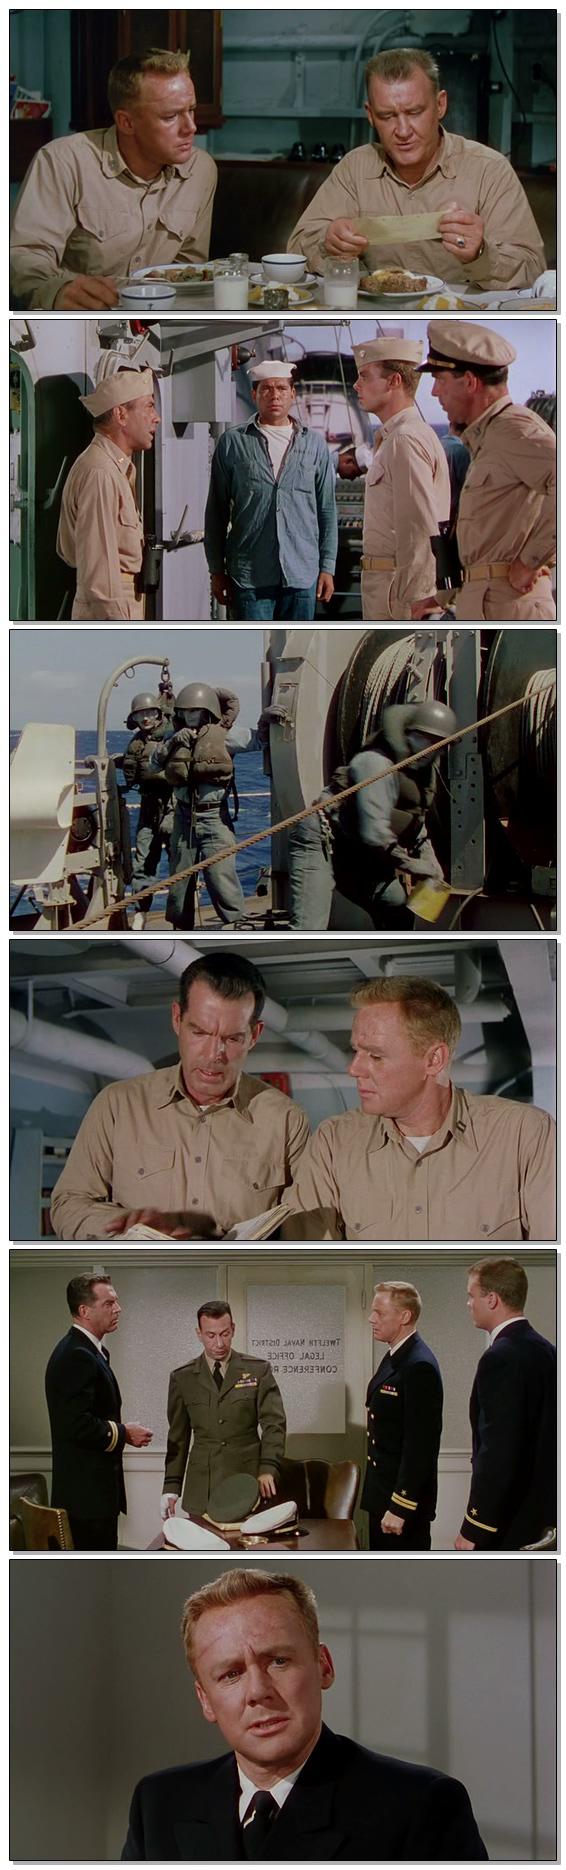 denizde.isyan.1954.trl3uay.jpg